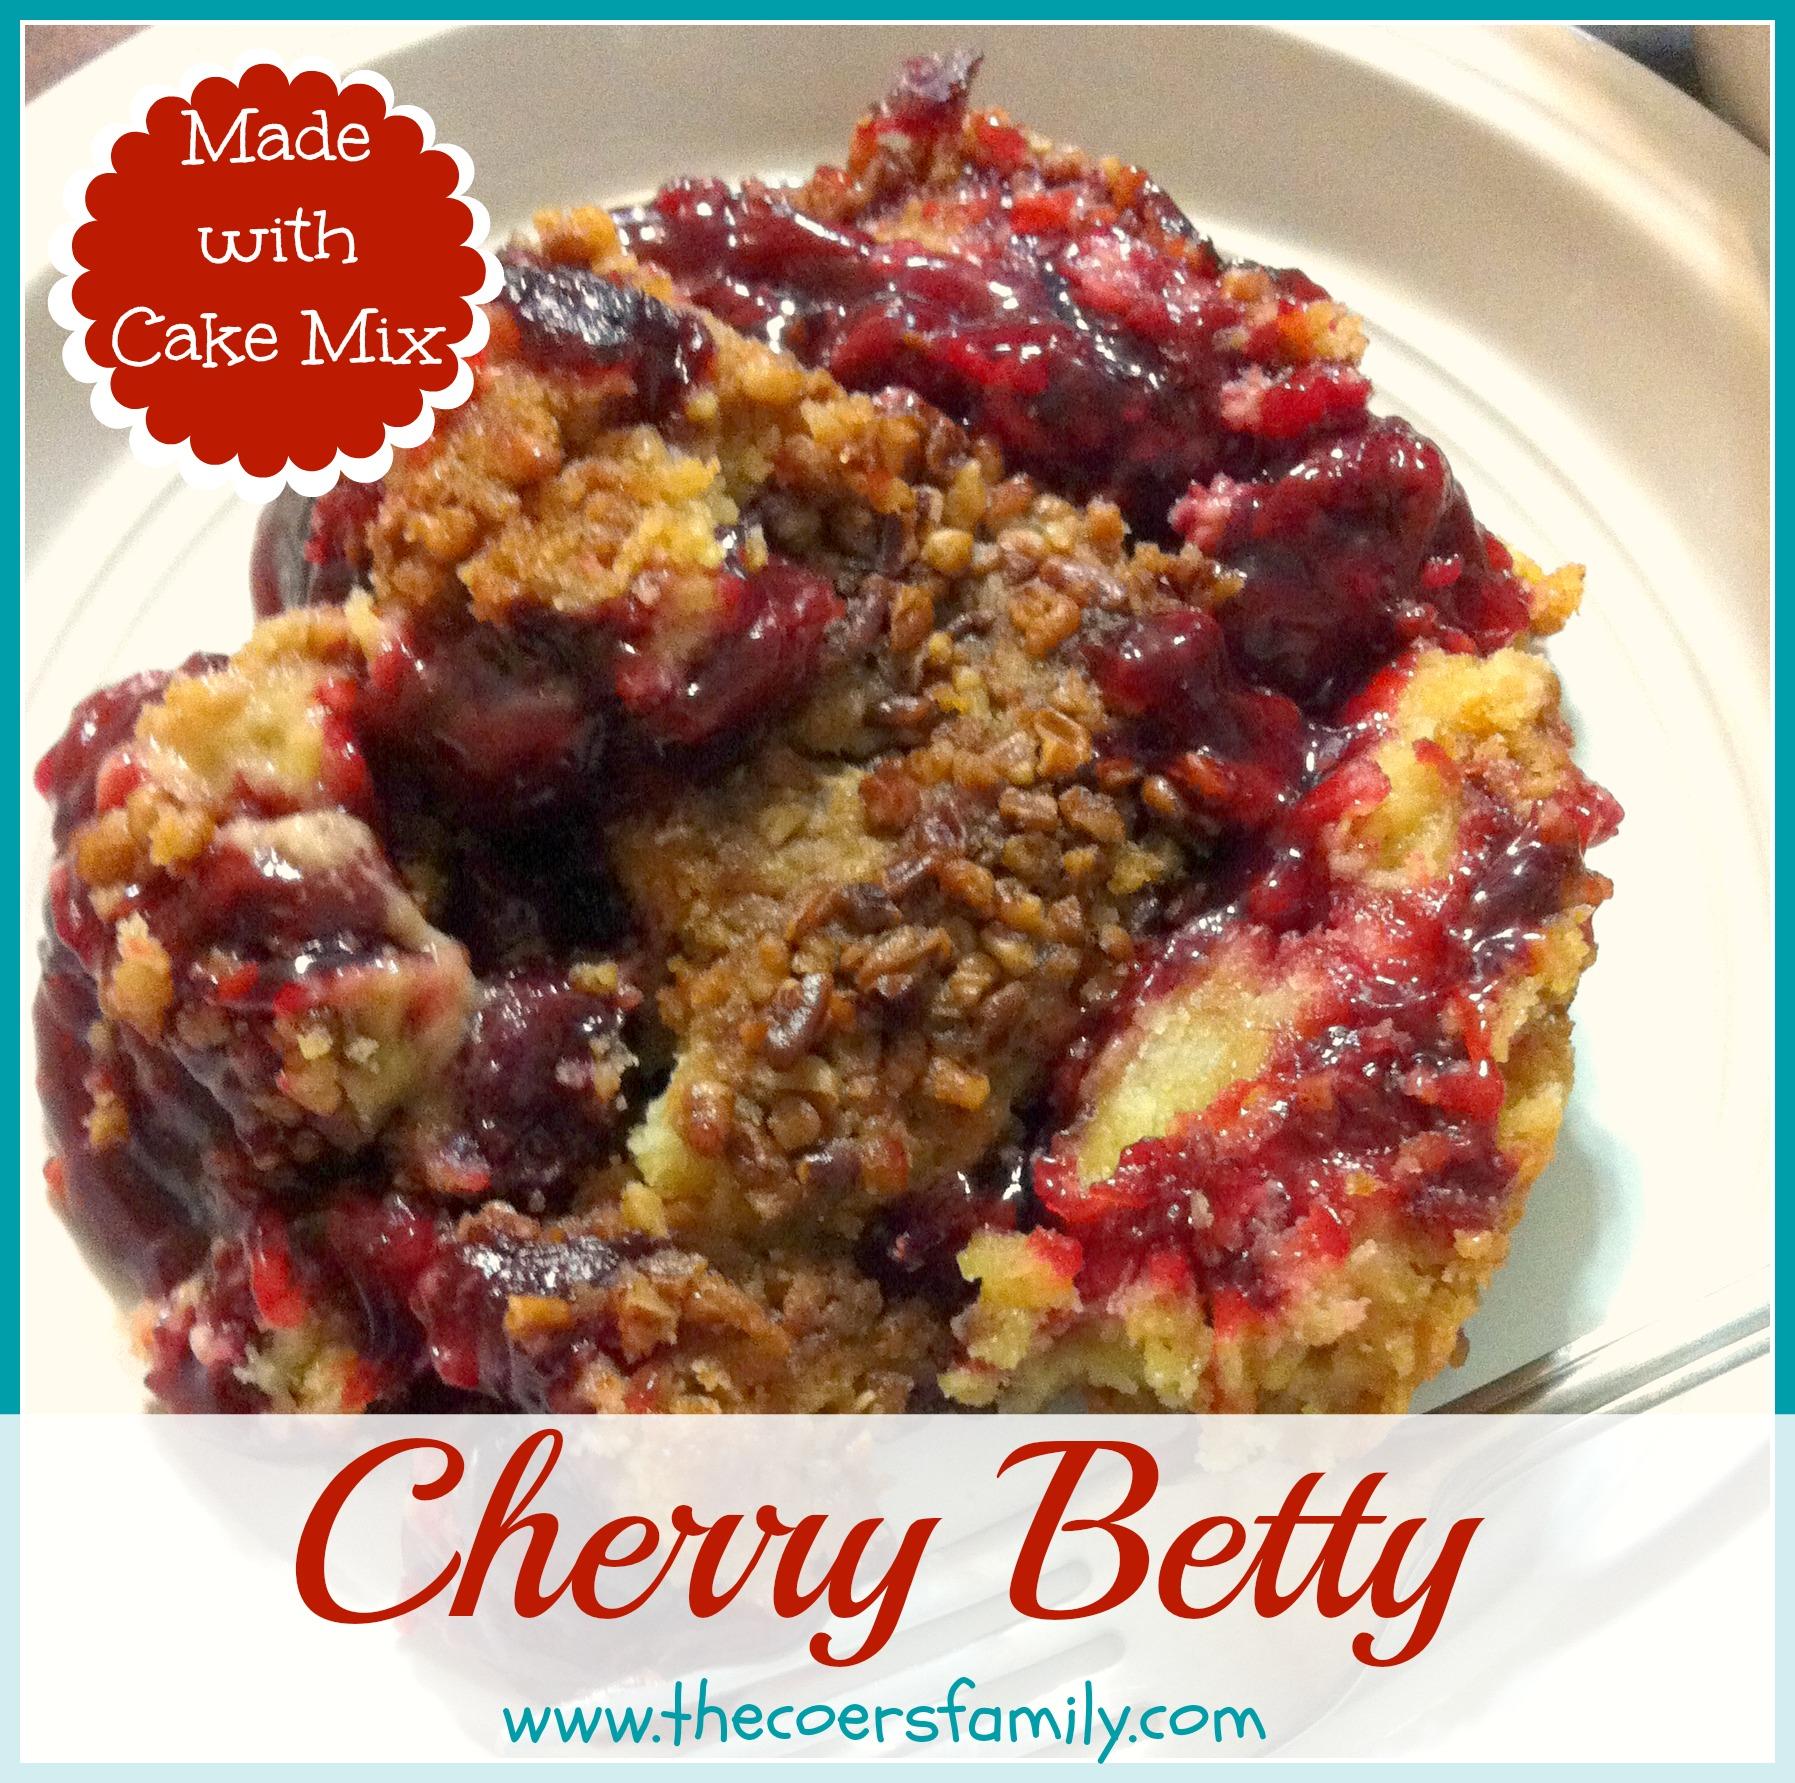 Cherry Dump Cake In Crock Pot With Fresh Cherries